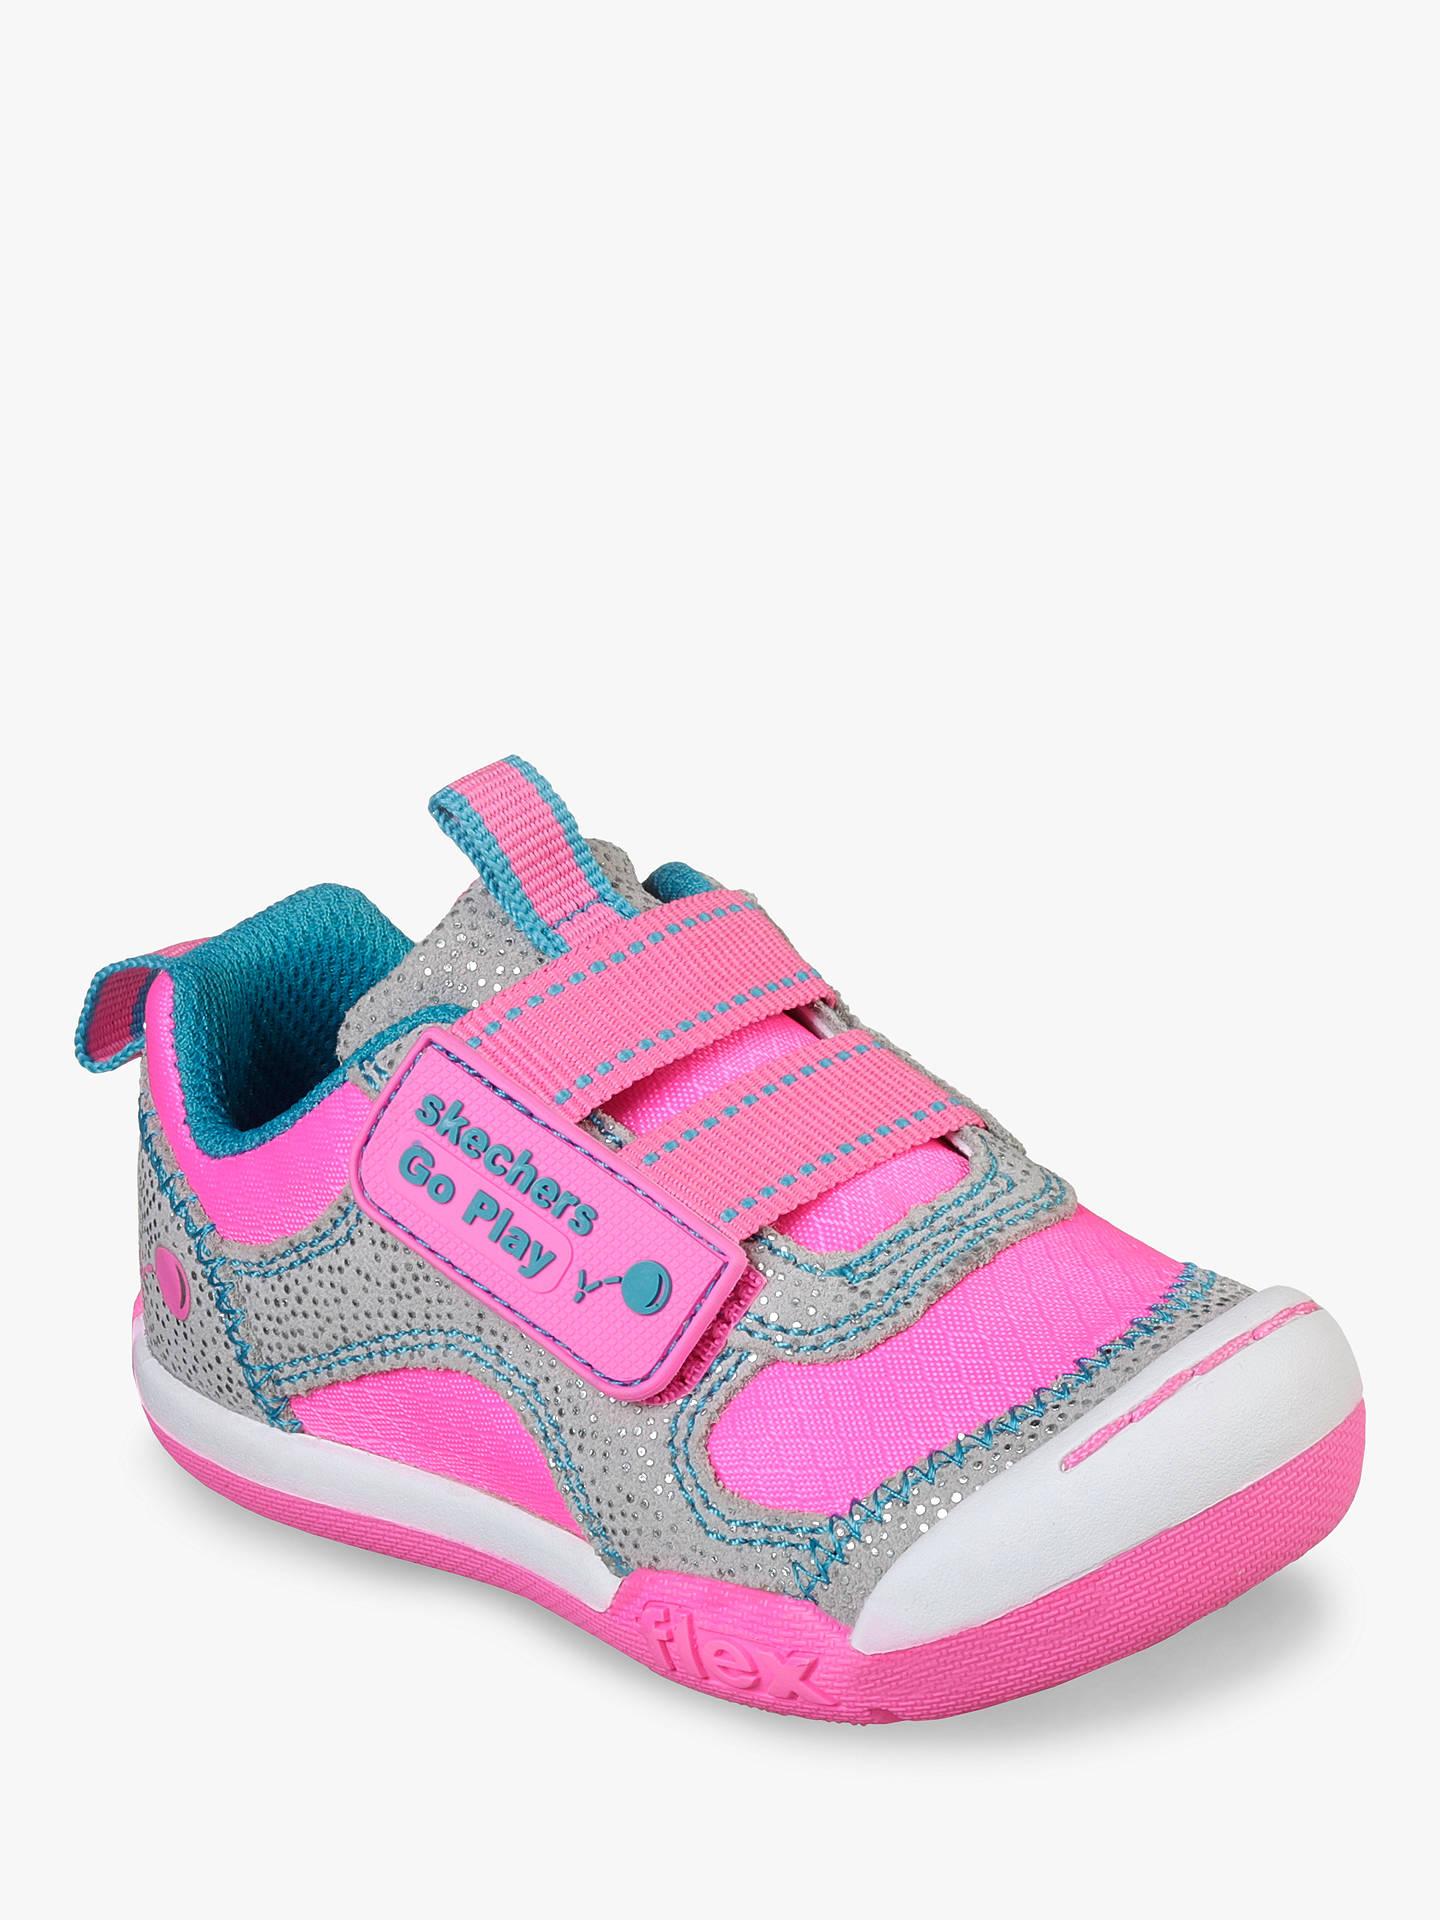 c80b598a8ddd1 Buy Skechers Children's Flex Play Trainers, Pink, 22 Online at johnlewis.  ...